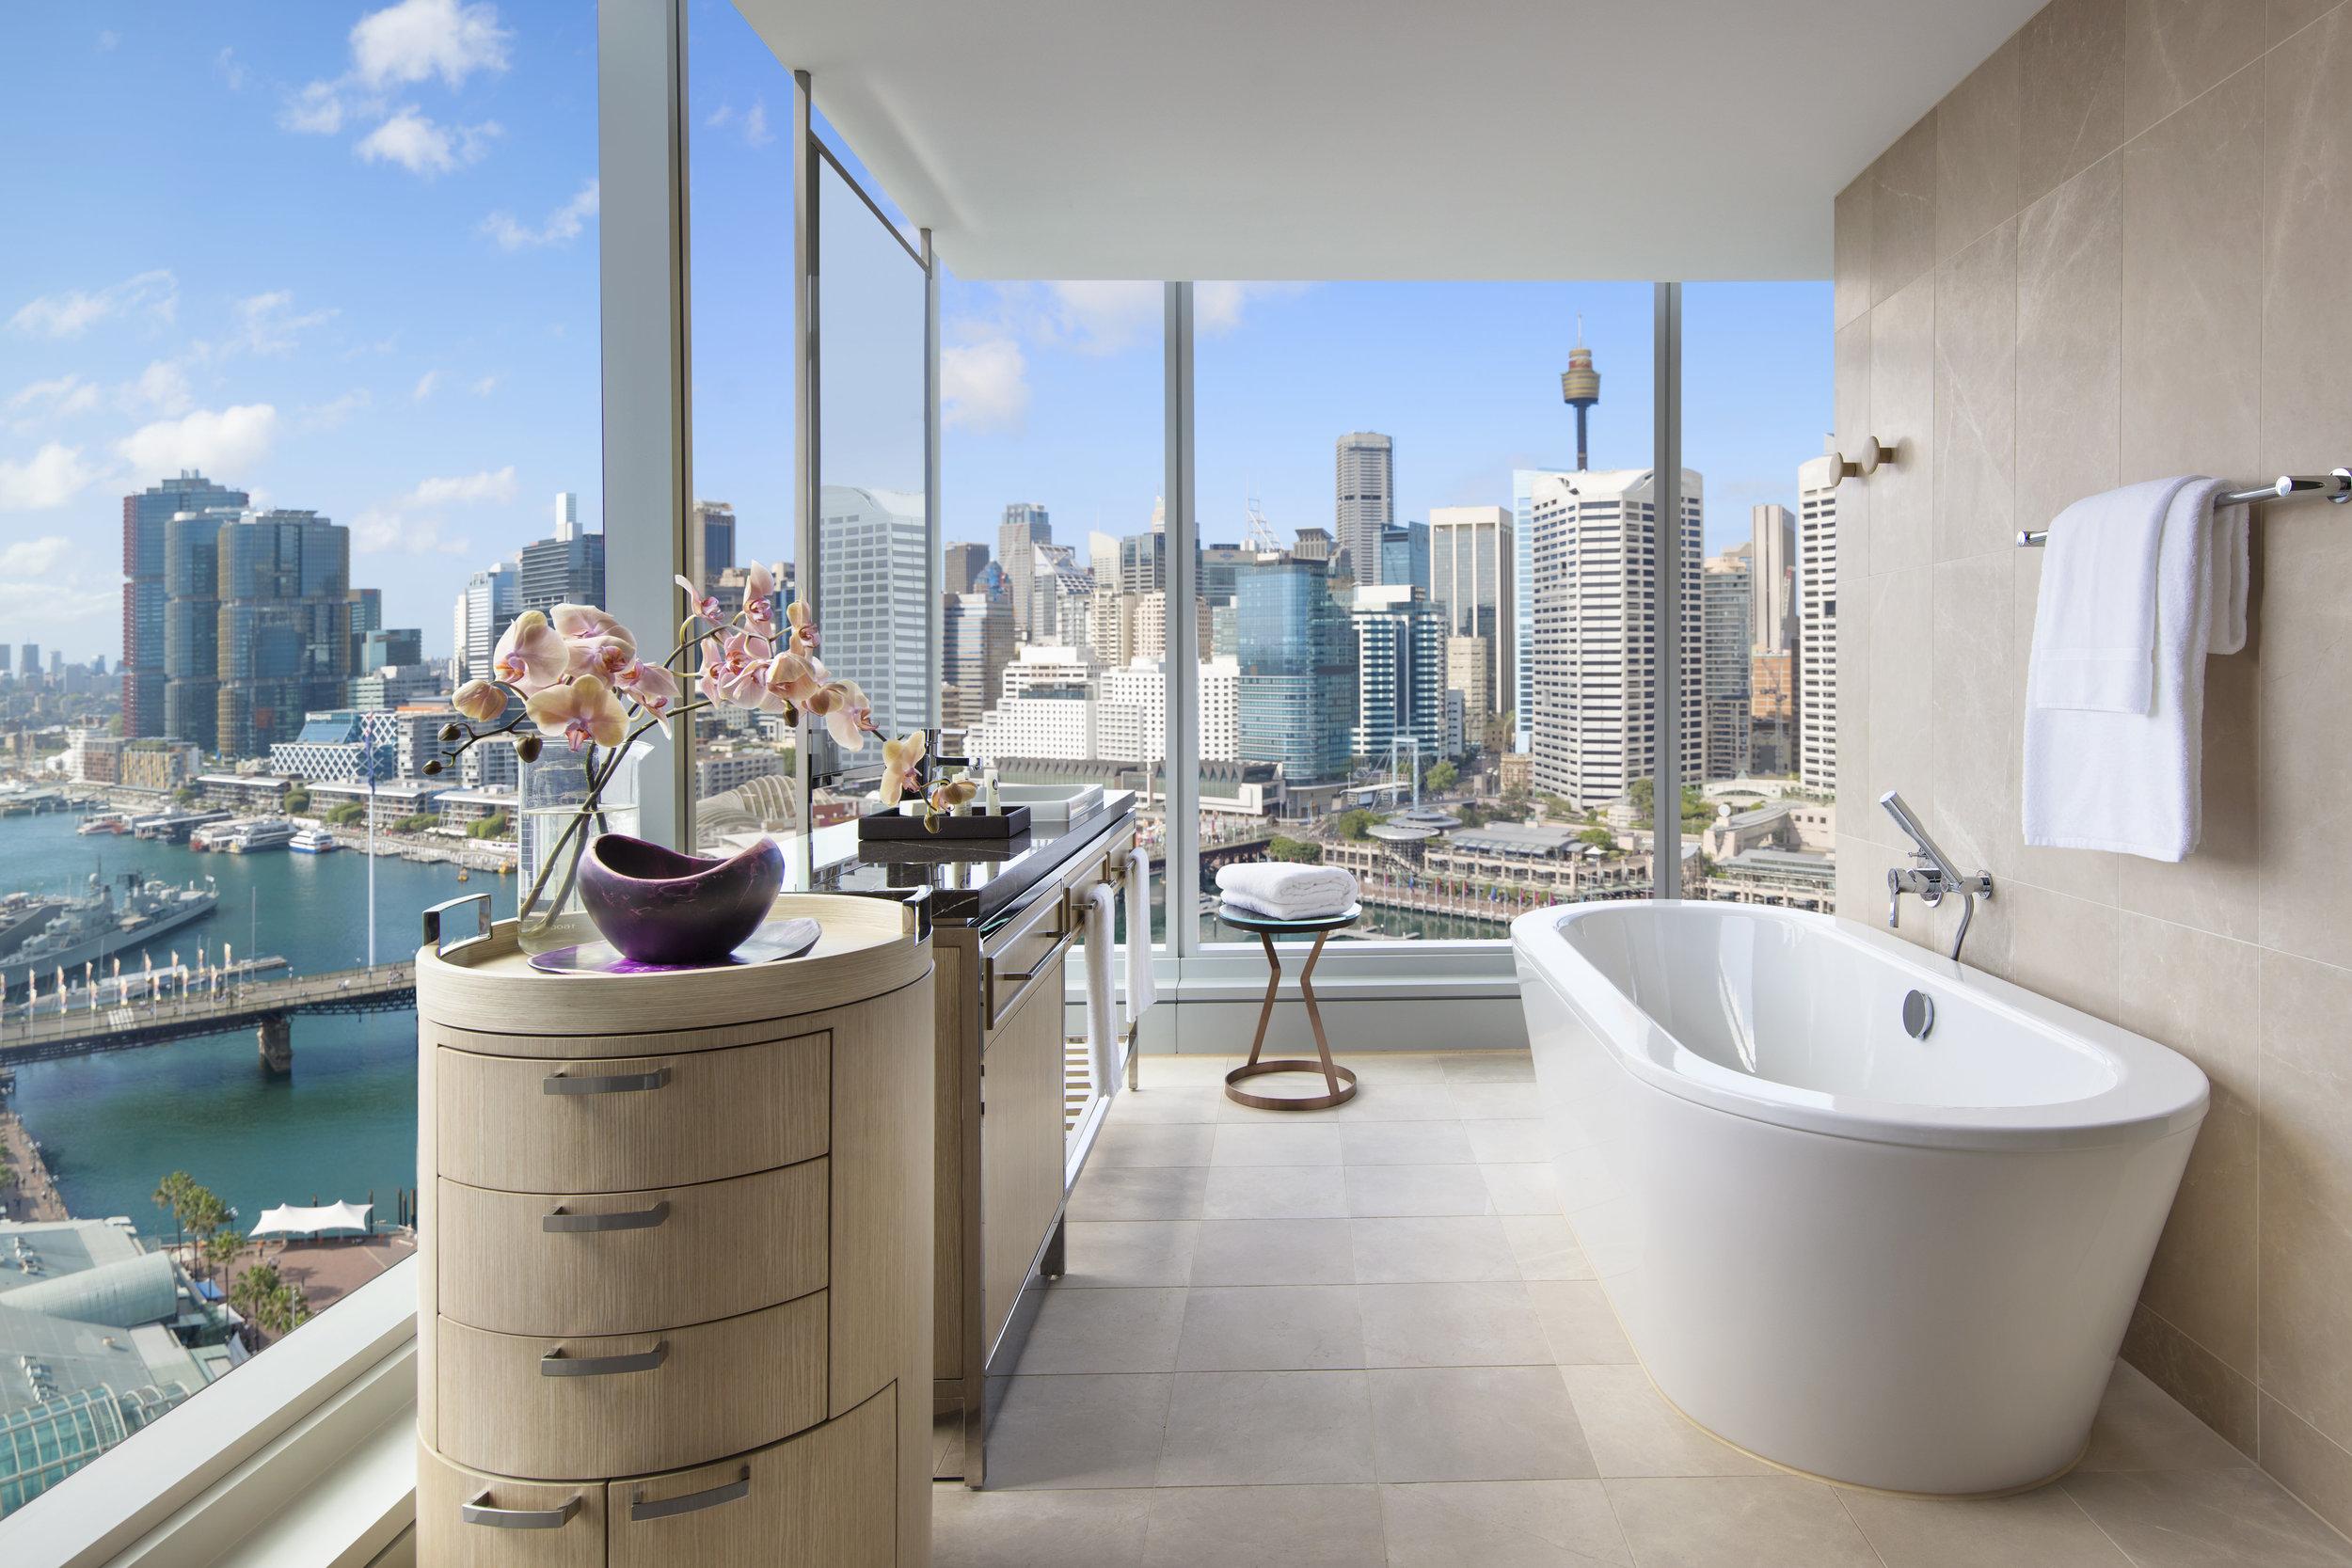 Bathroom | Photo Credit:Sofitel Sydney Darling Harbour